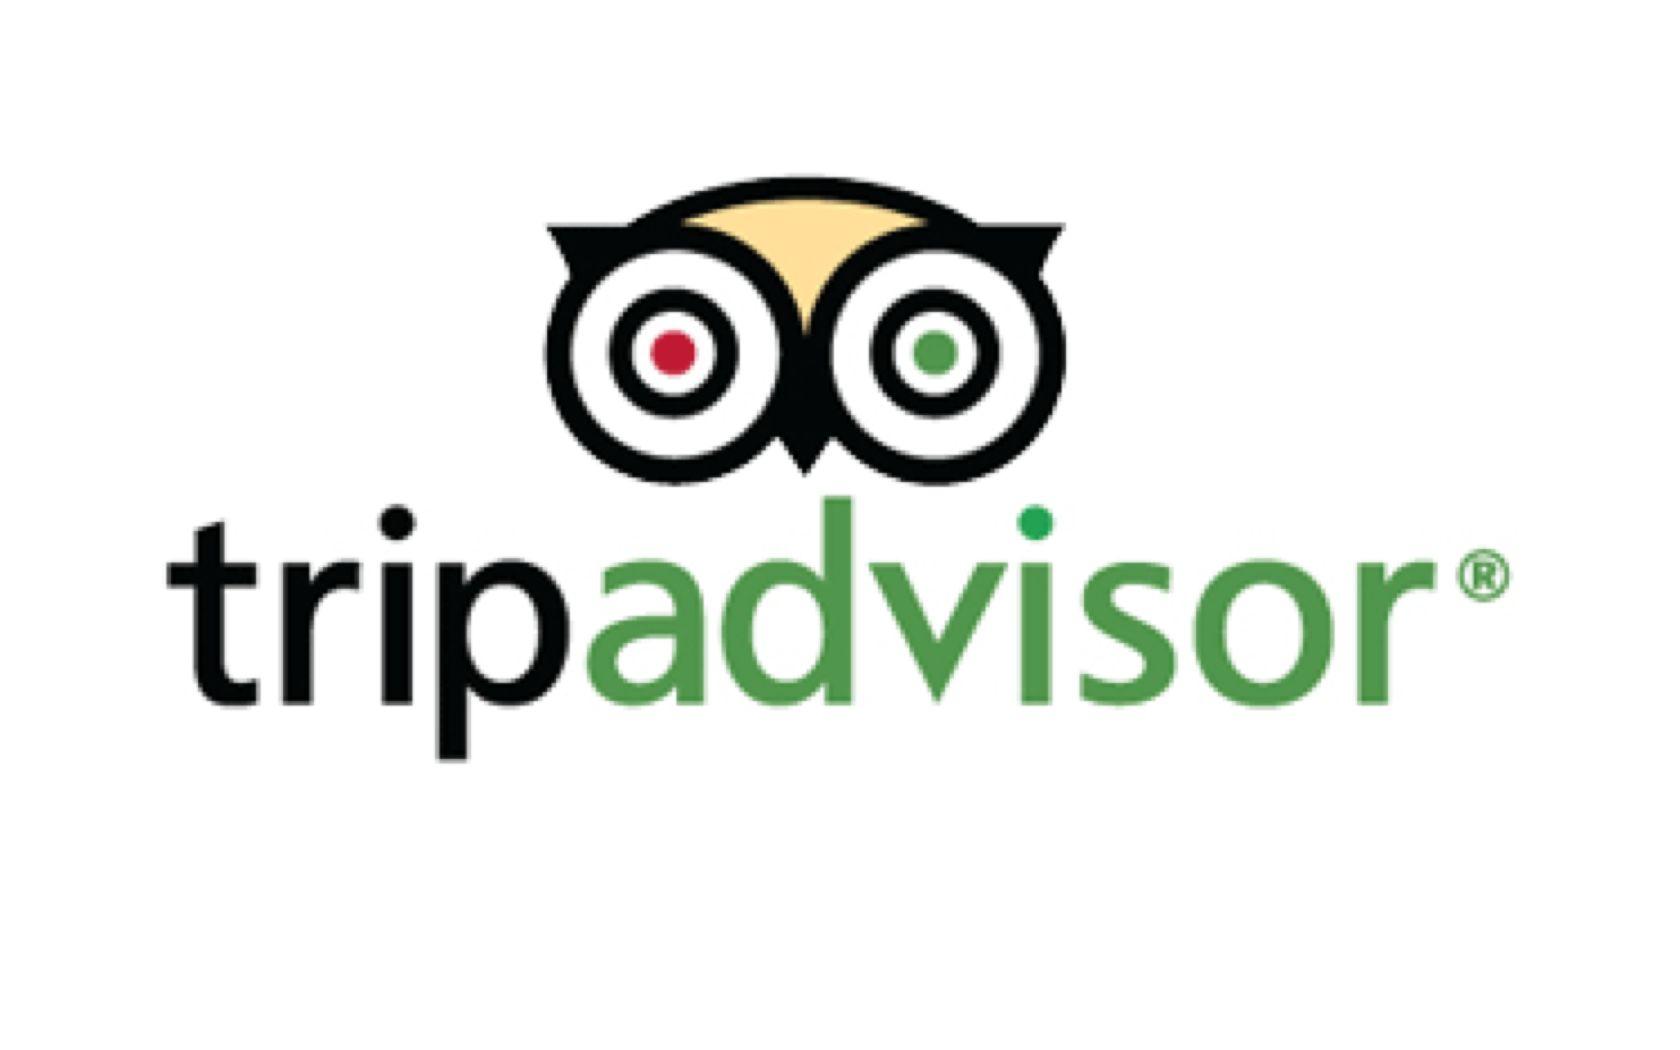 tripadvisor-logo-vector-downloadjpg